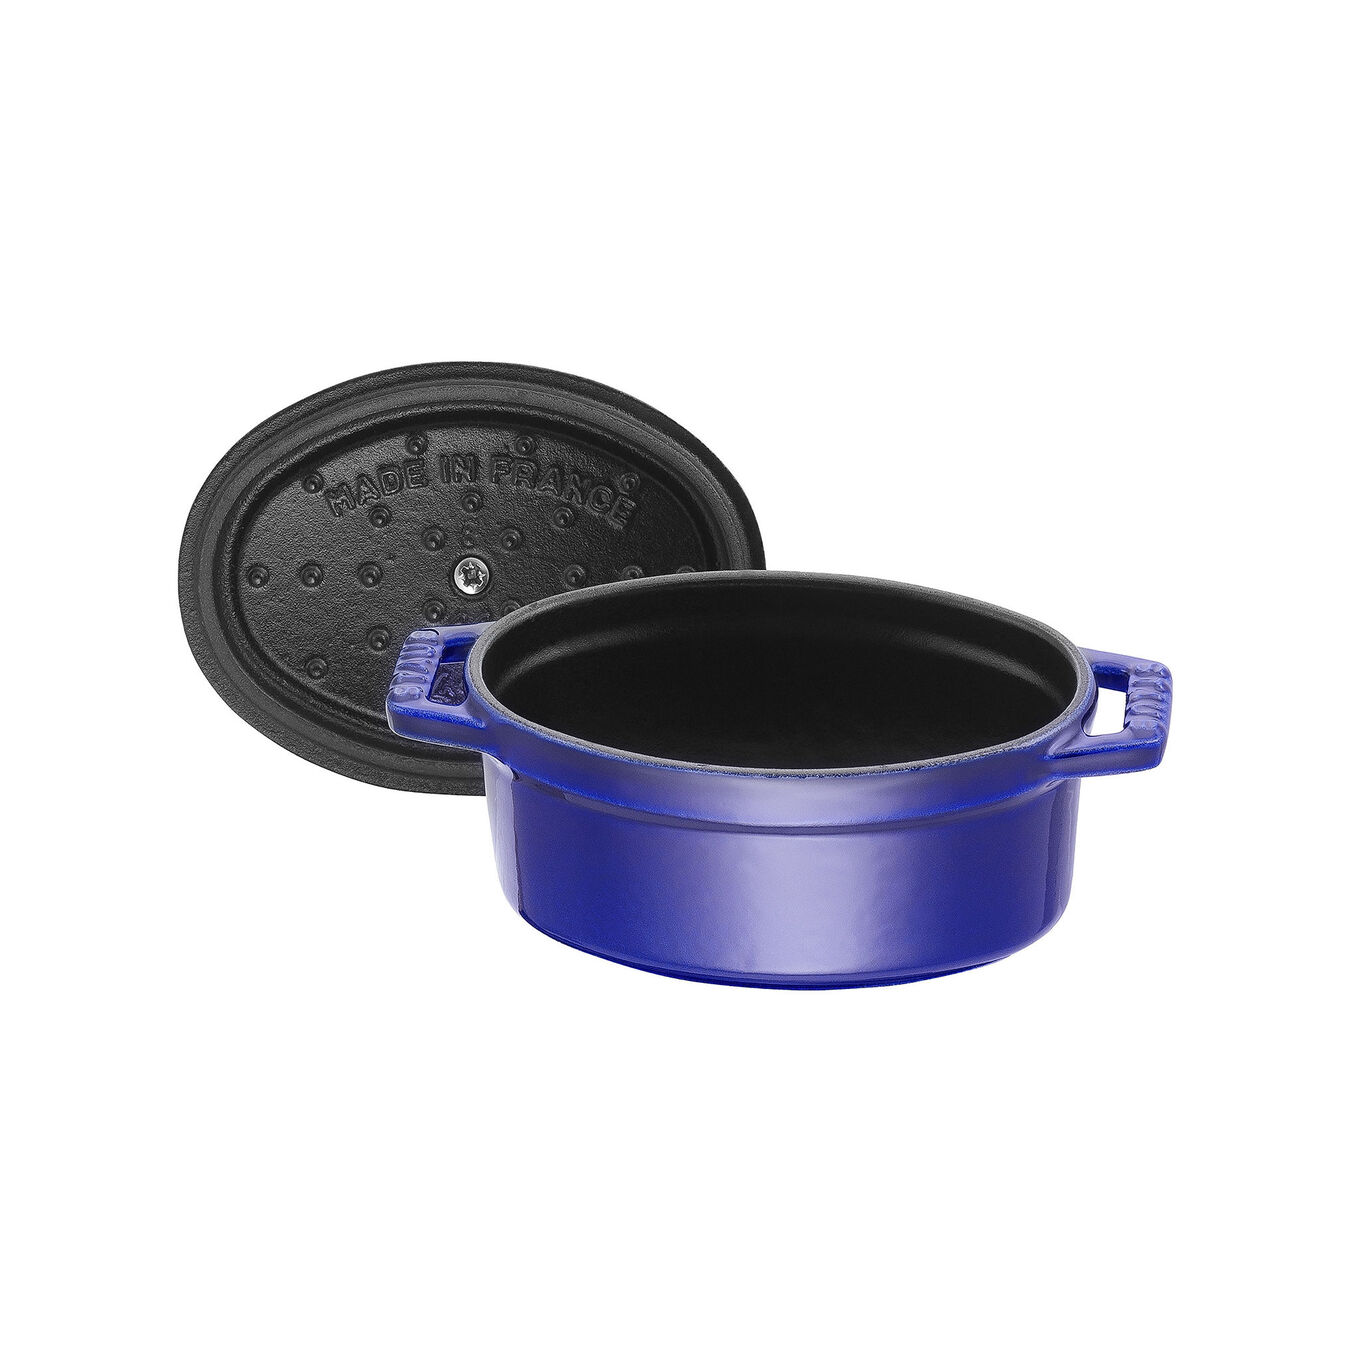 Mini Cocotte 11 cm, Ovale, Bleu intense, Fonte,,large 5